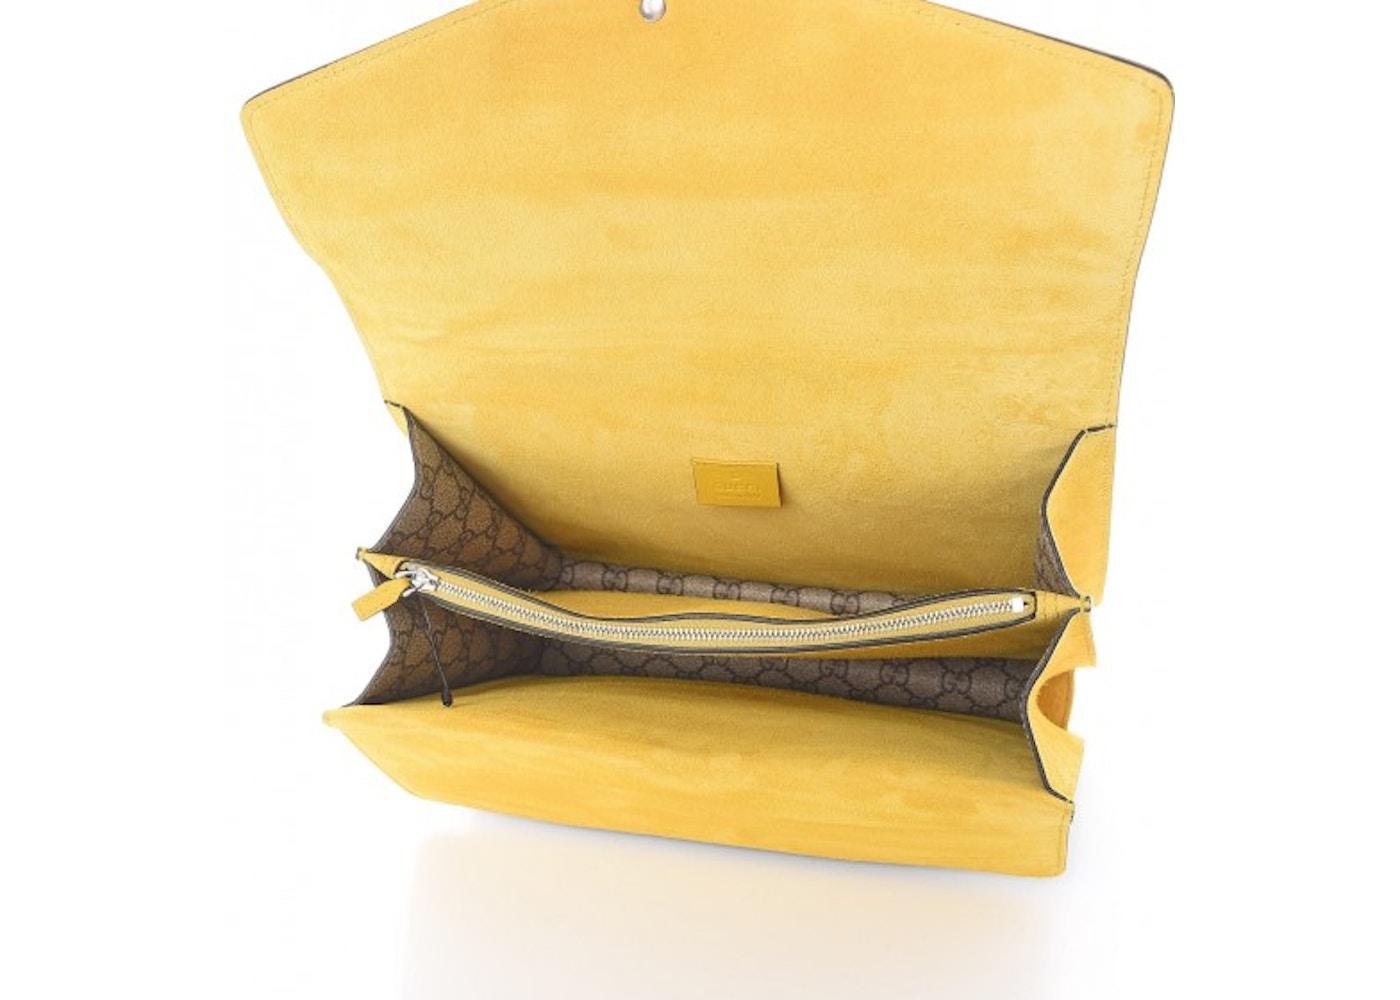 55121dda2ceb Gucci Dionysus Monogram GG Supreme Bow/Embroidered Crystal Medium Yellow